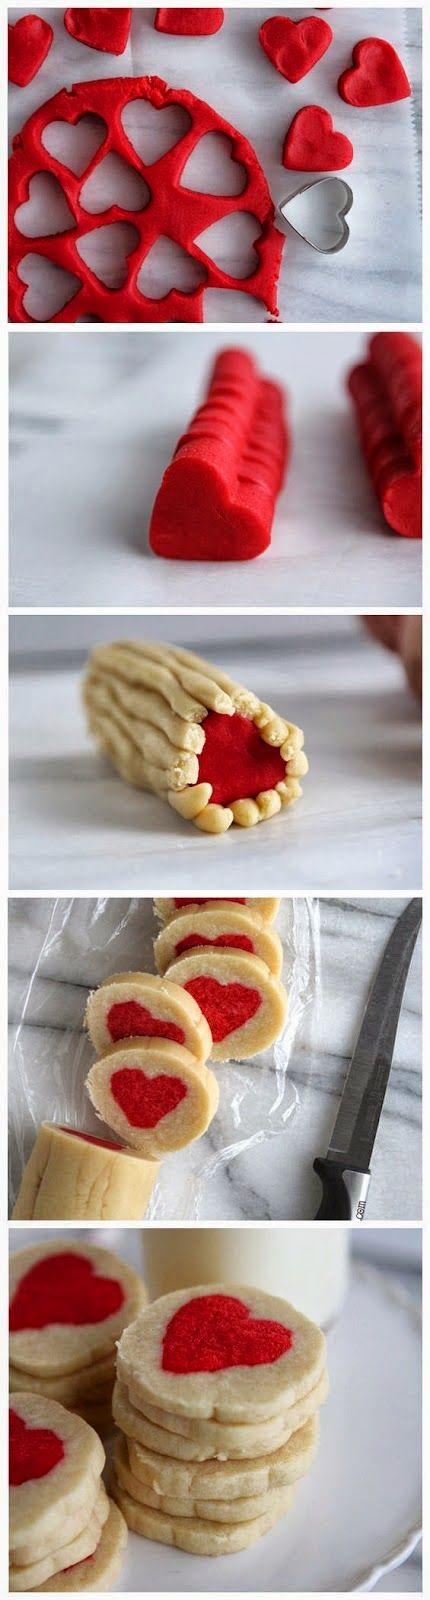 Slice n' Bake Valentine Heart Cookies   #valentines #valentinesday #vday #happyvalentinesday #valentinesdayplanning #valentinesdaydecor #valentinesdaybaking #valentinesdaybeauty www.gmichaelsalon.com